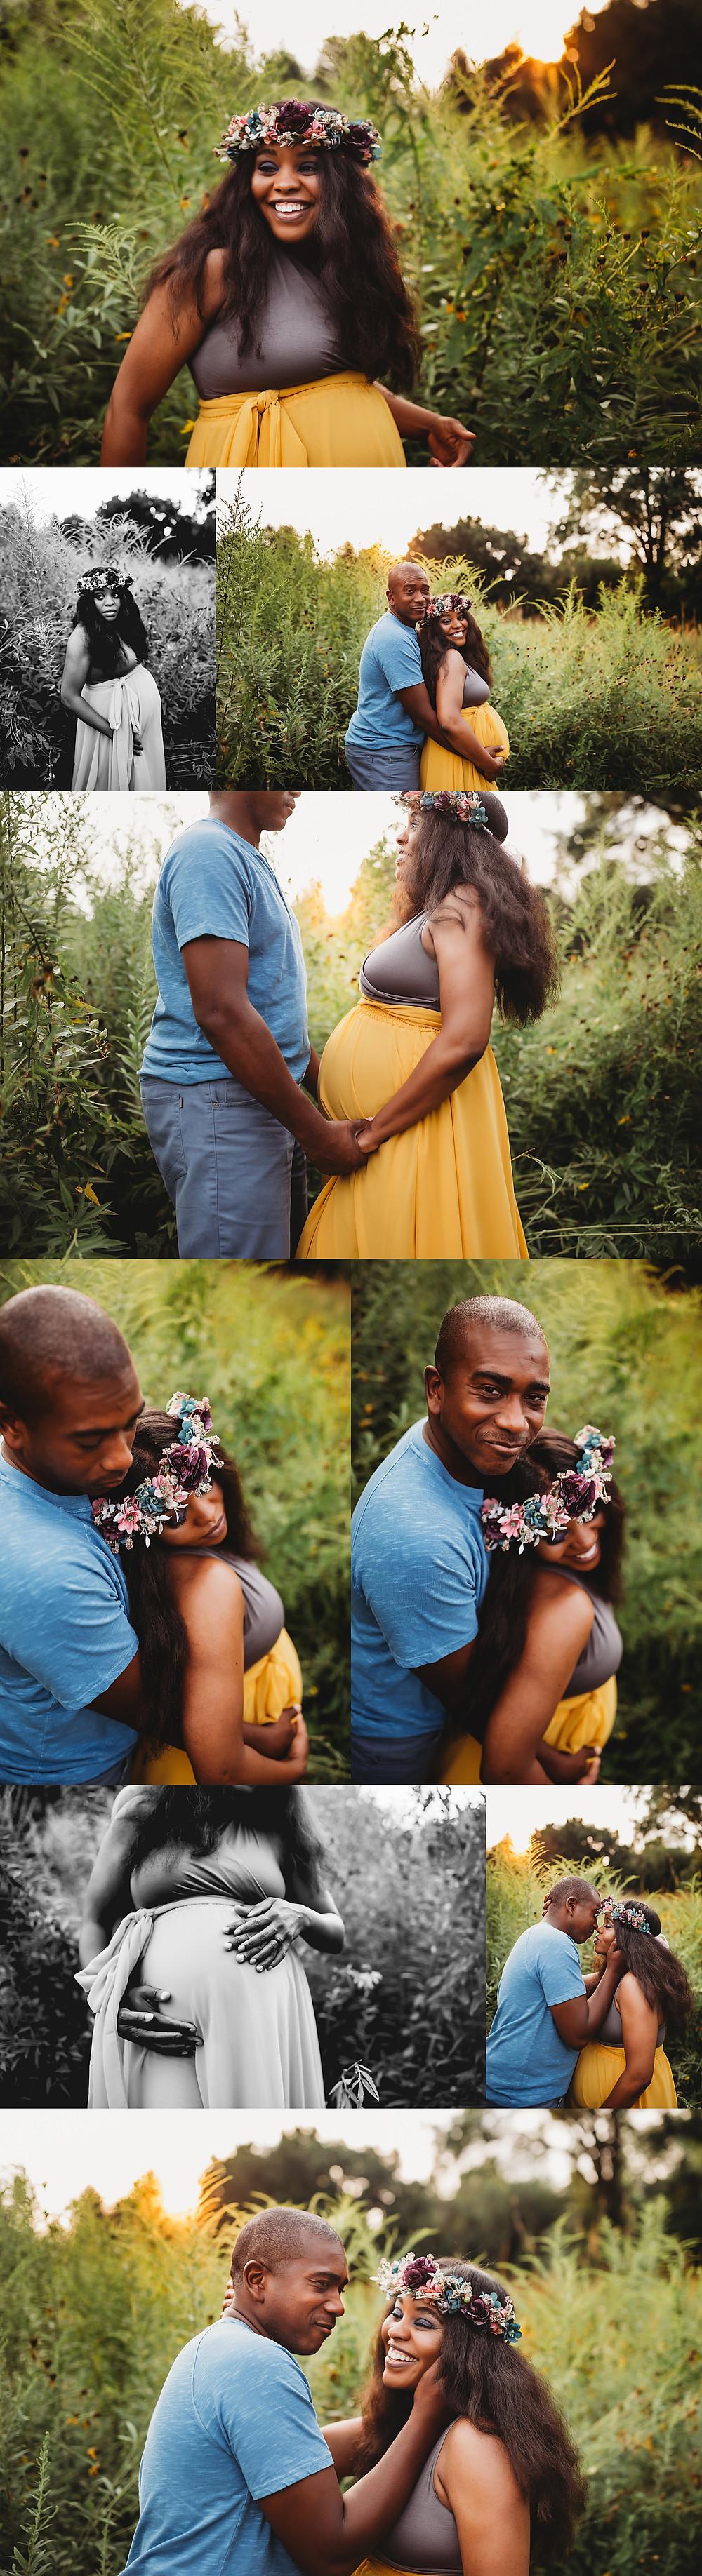 Indianapolis Maternity Photographer | Alex Morris Design | Baby